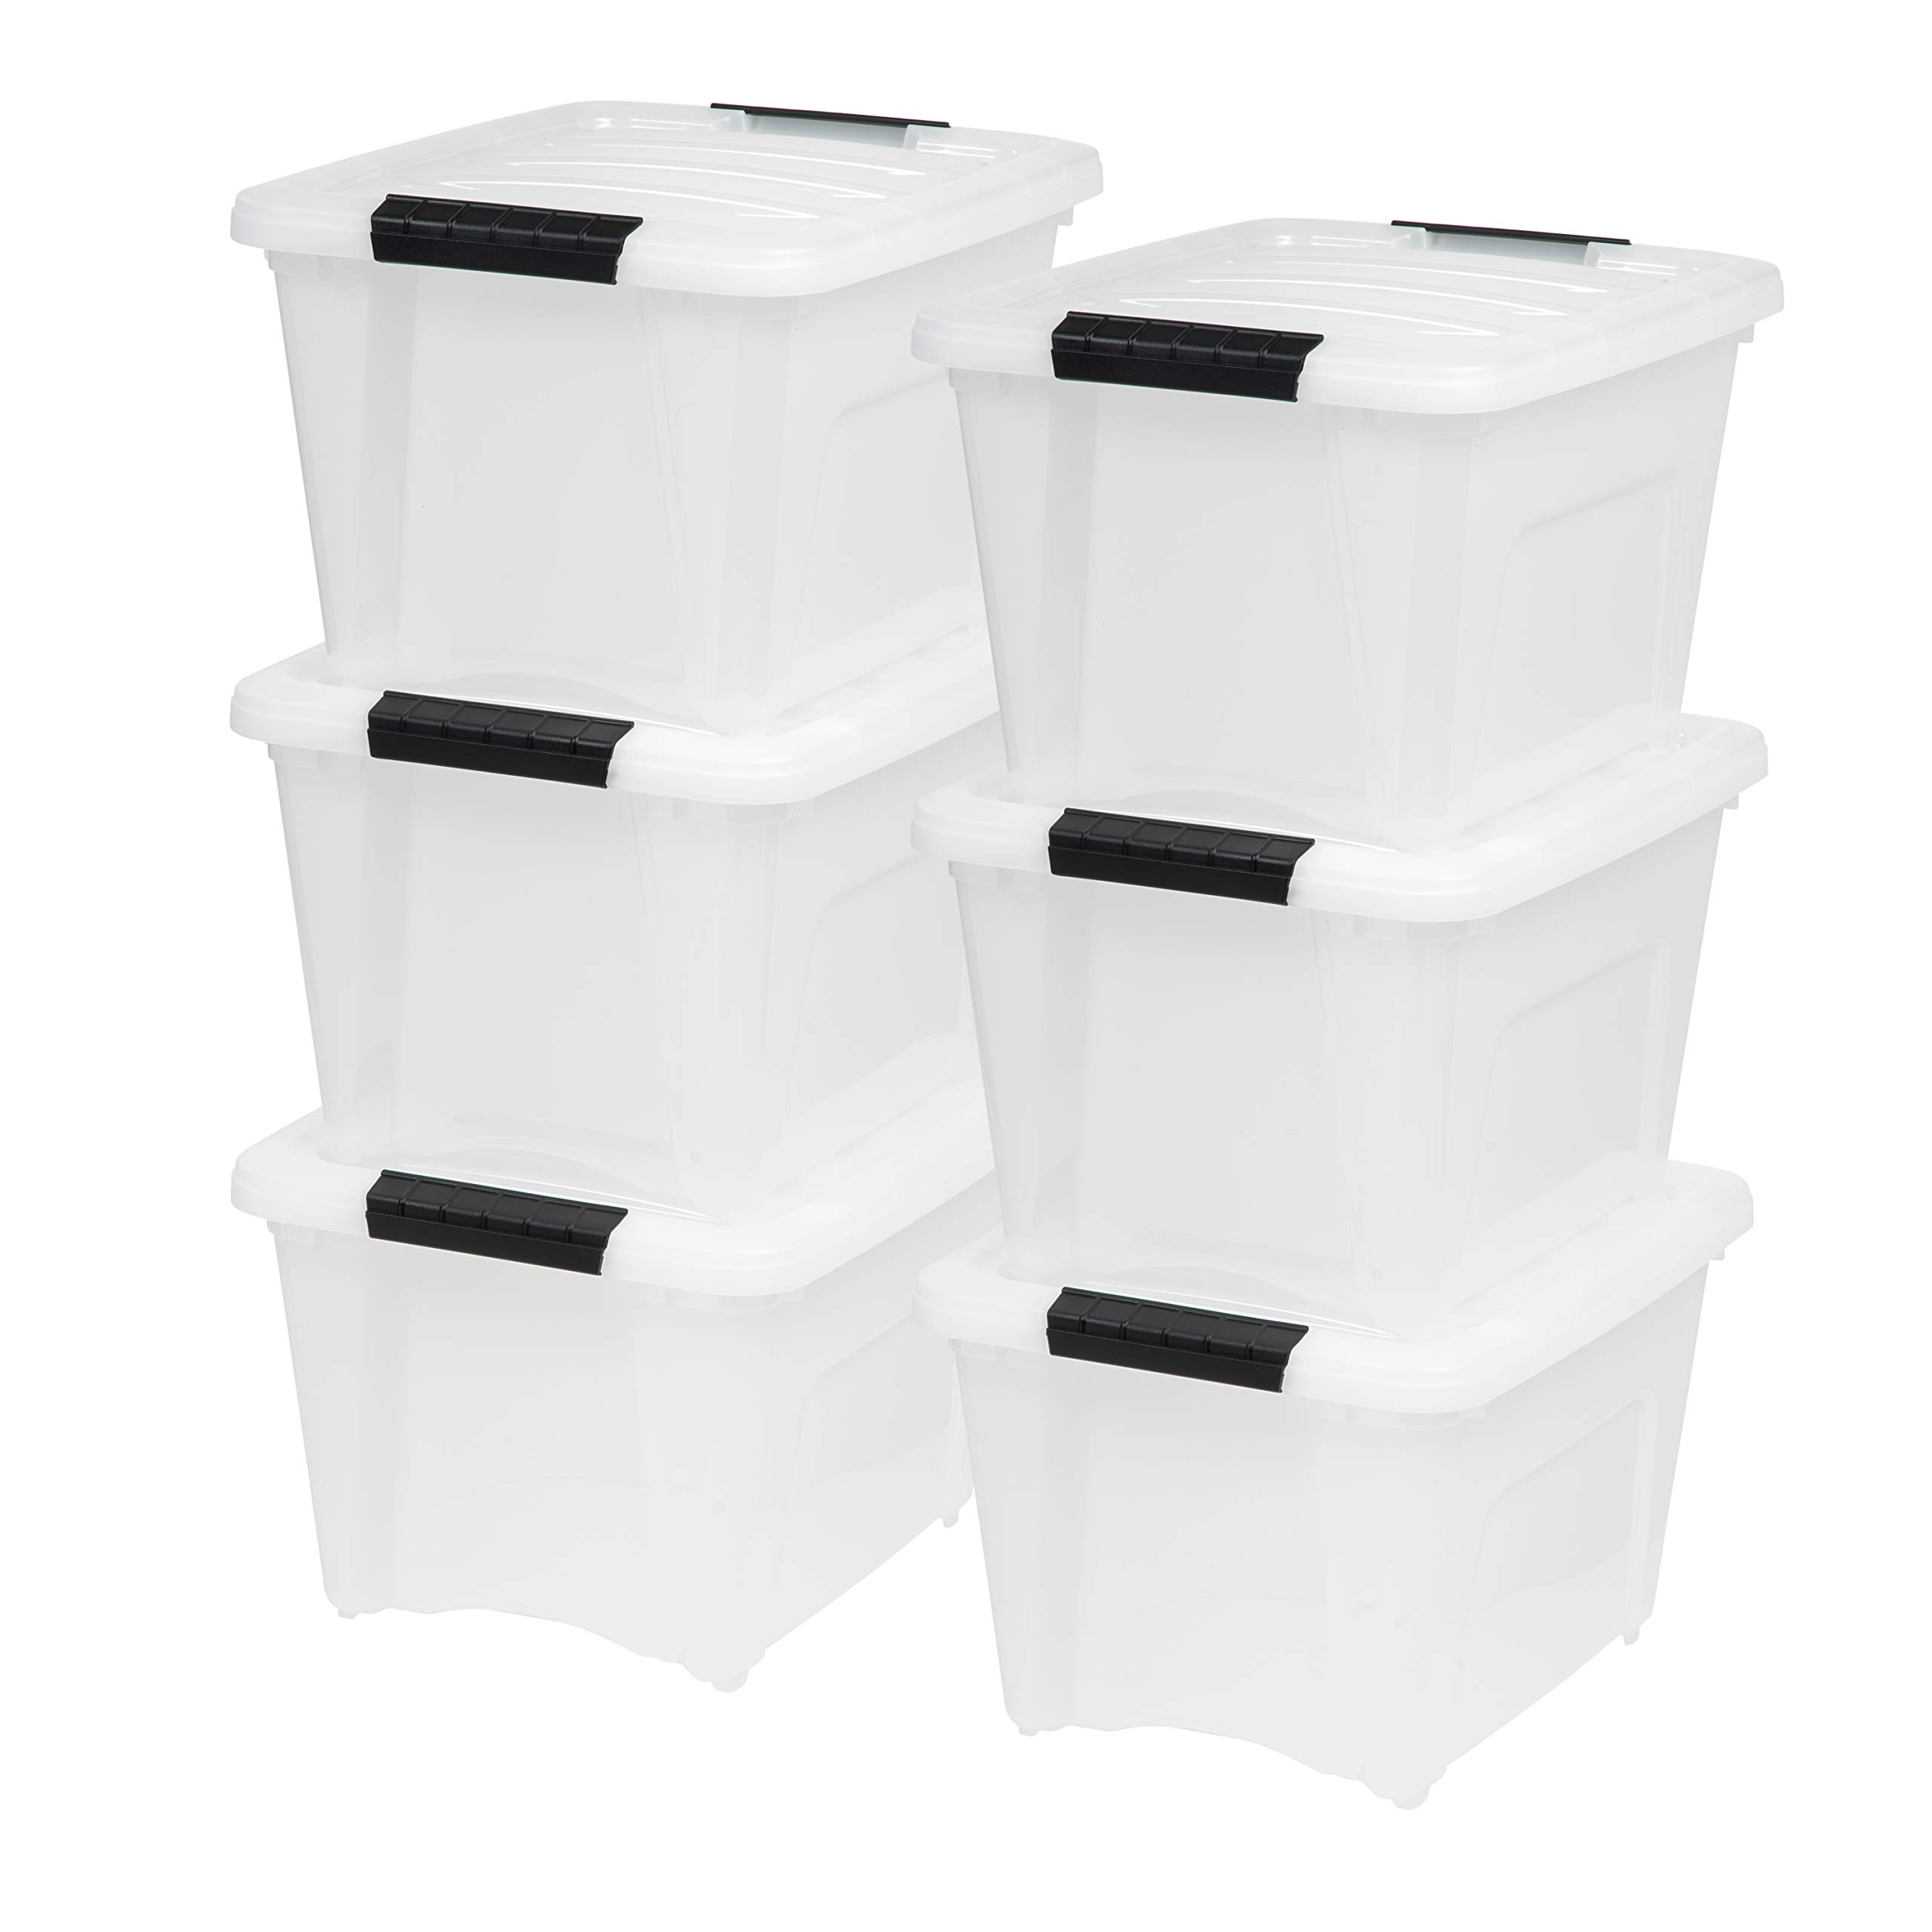 IRIS USA, Inc TB-17 19 Quart Stack & Pull Box, Multi-Purpose Storage Bin, 6 Pack, Pearl by IRIS USA, Inc.